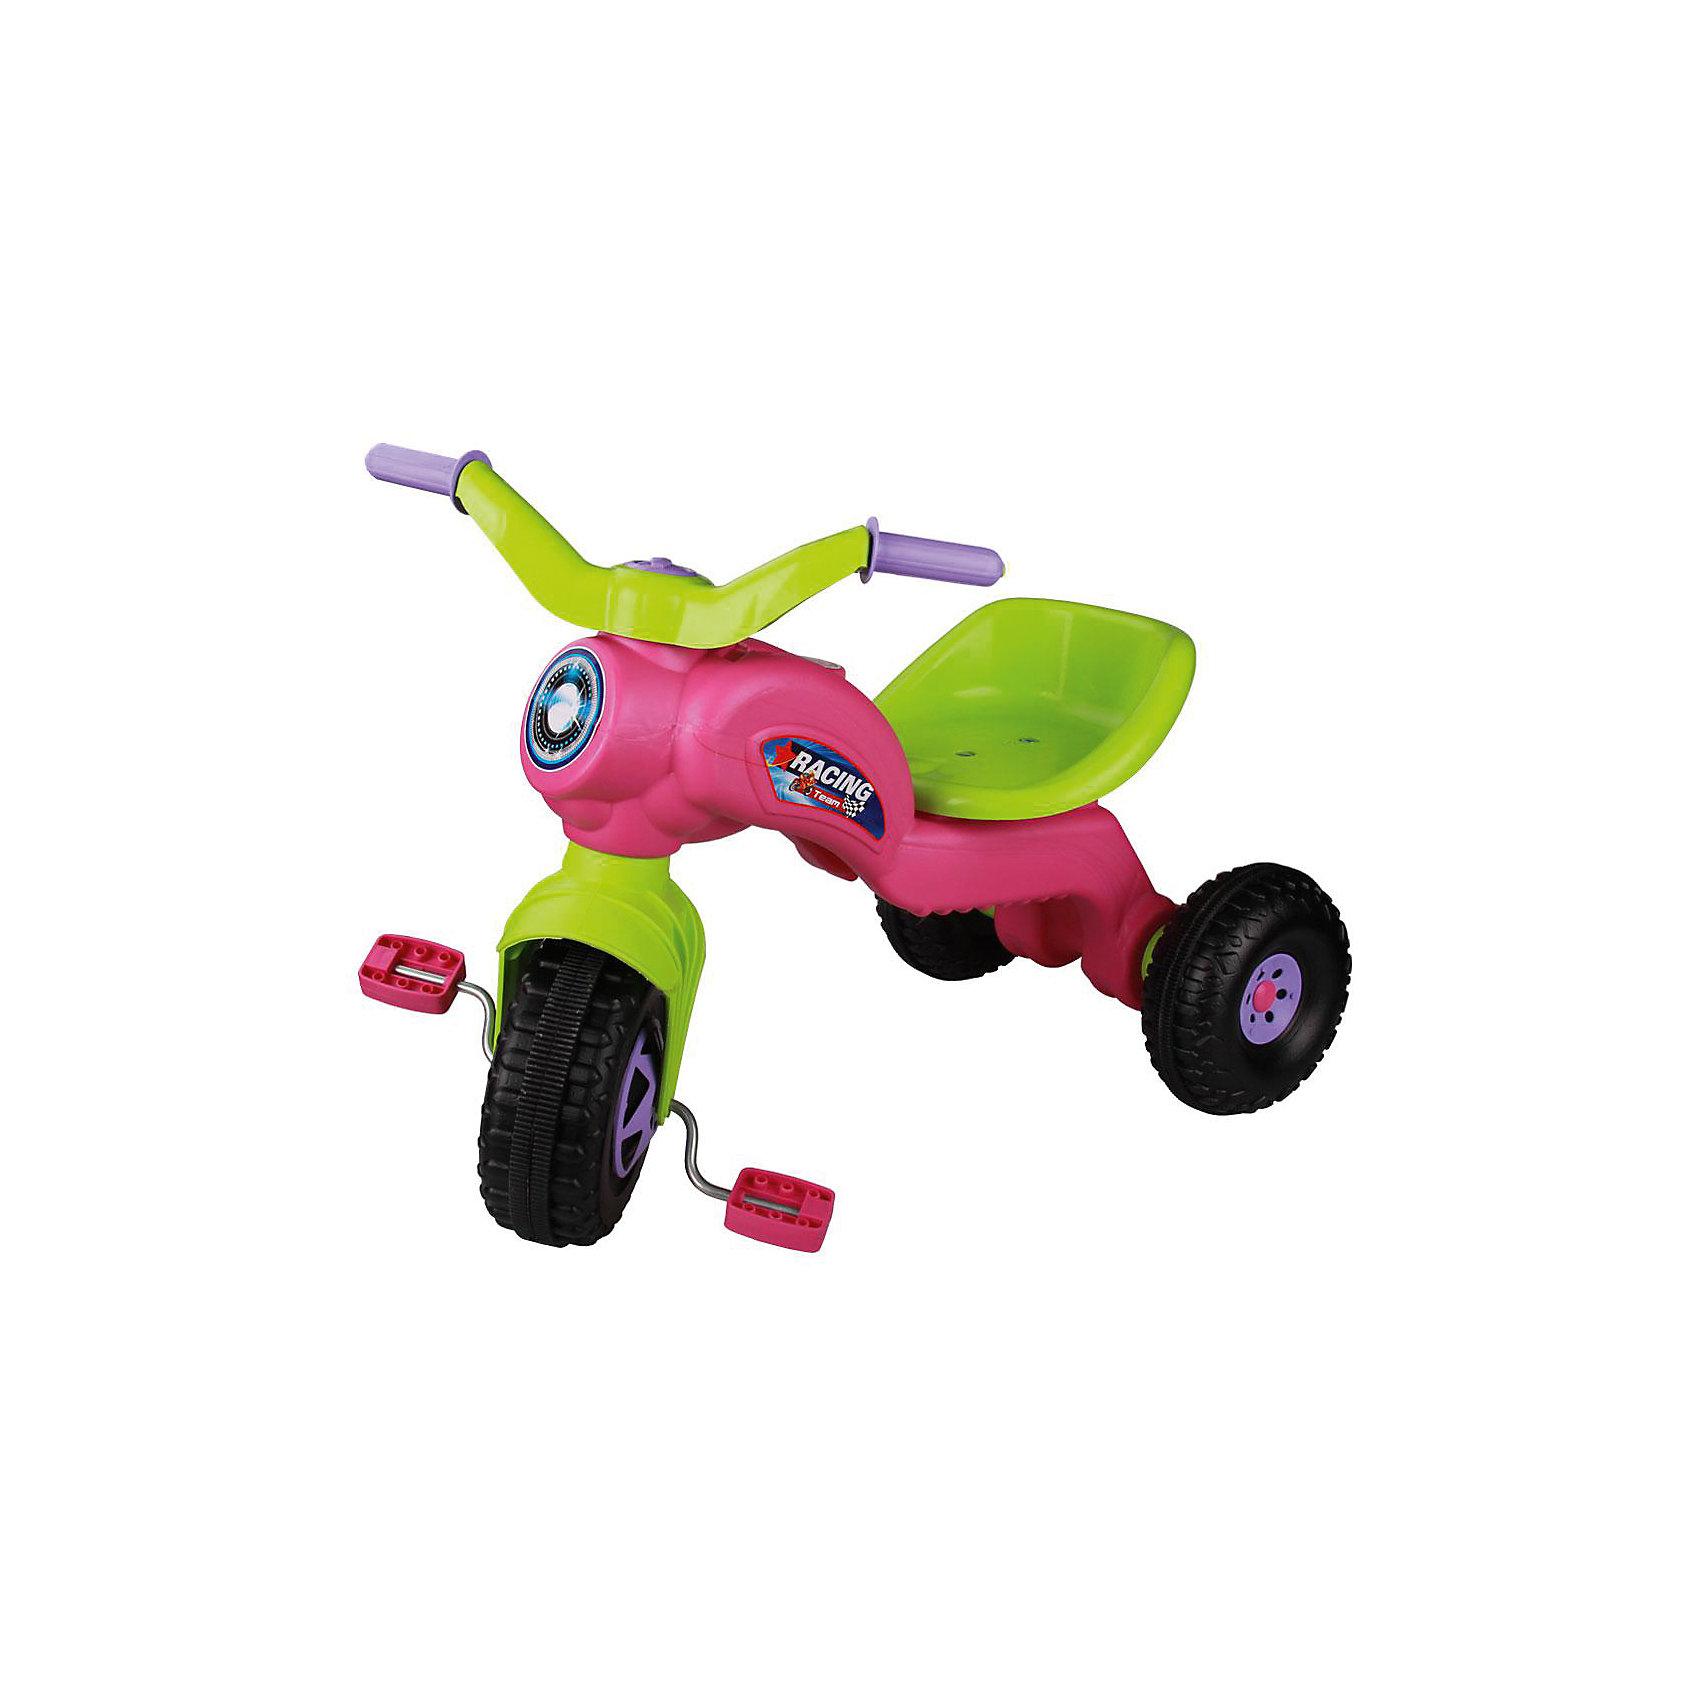 Alternativa Велосипед трехколесный Чемпион ,  Alternativa, розовый alternativa ящик для инструментов 585х255х250 alternativa